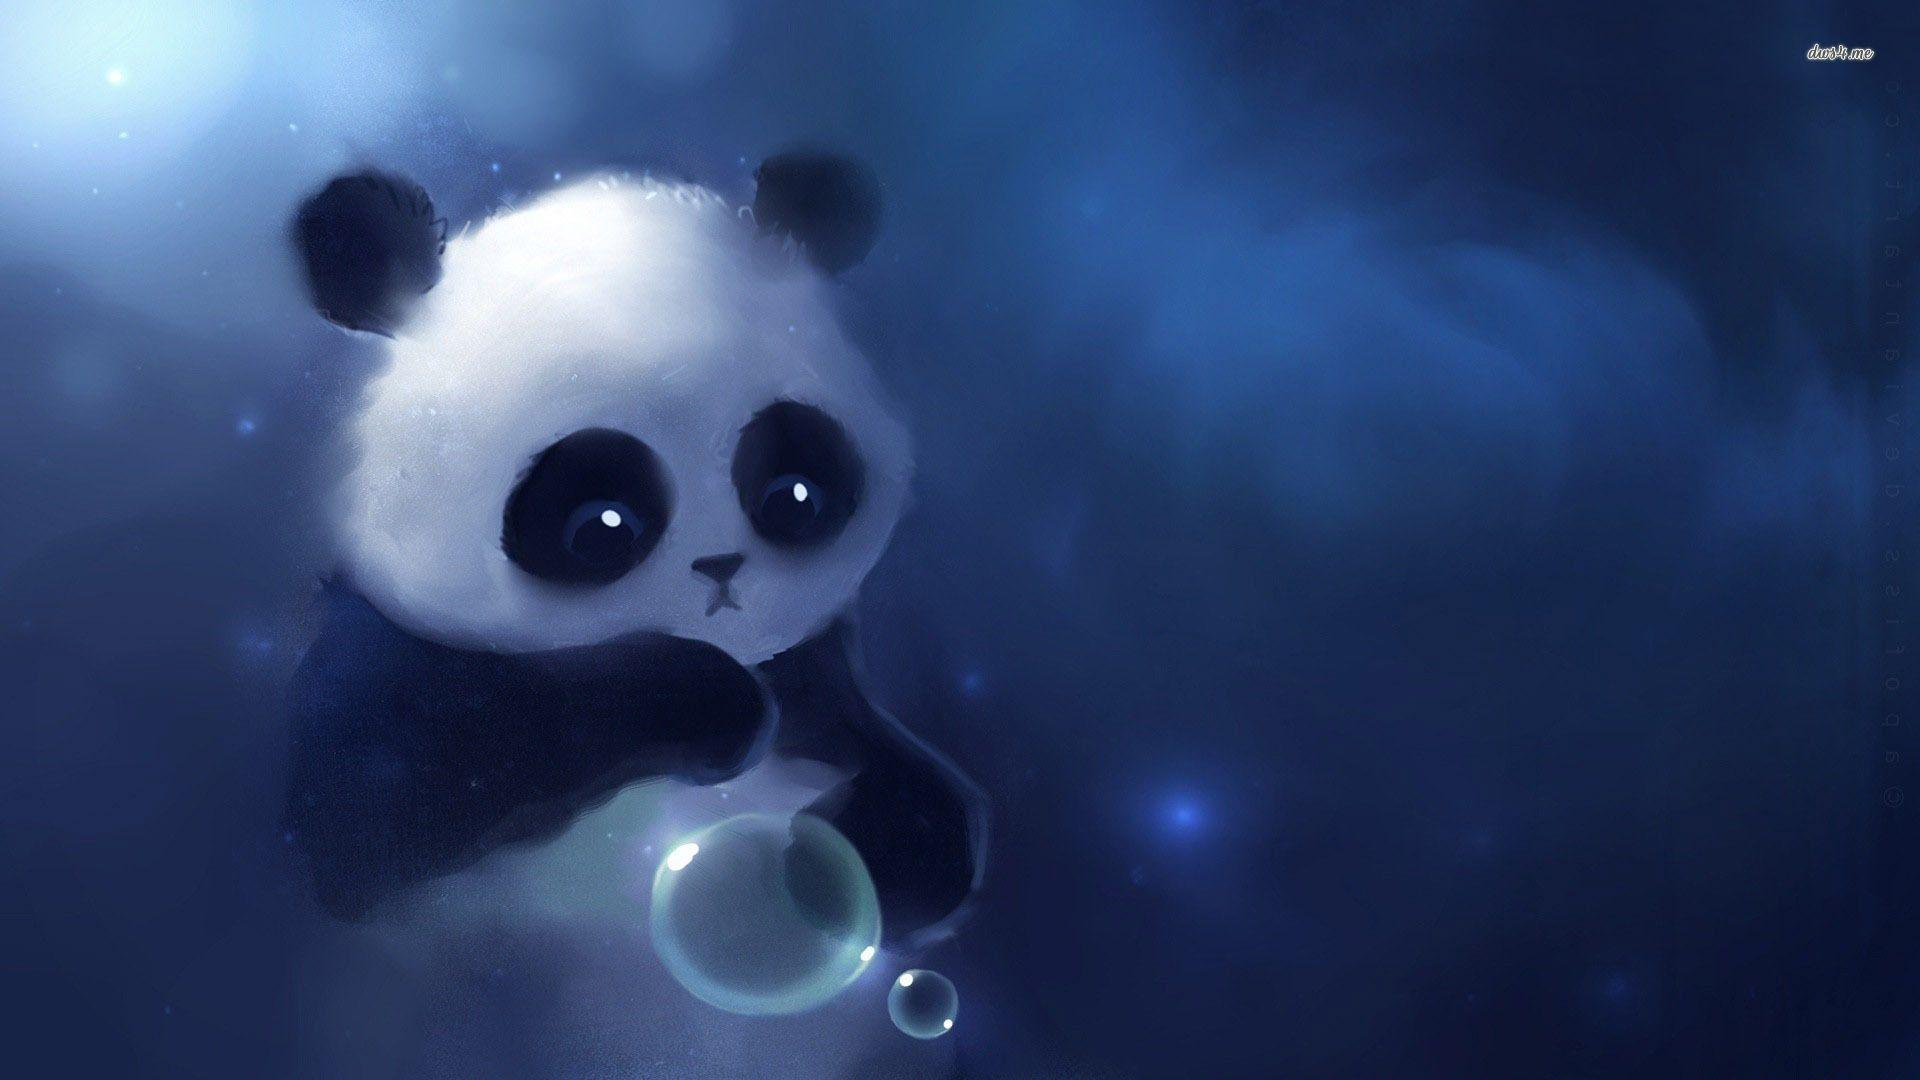 Panda and Bubble